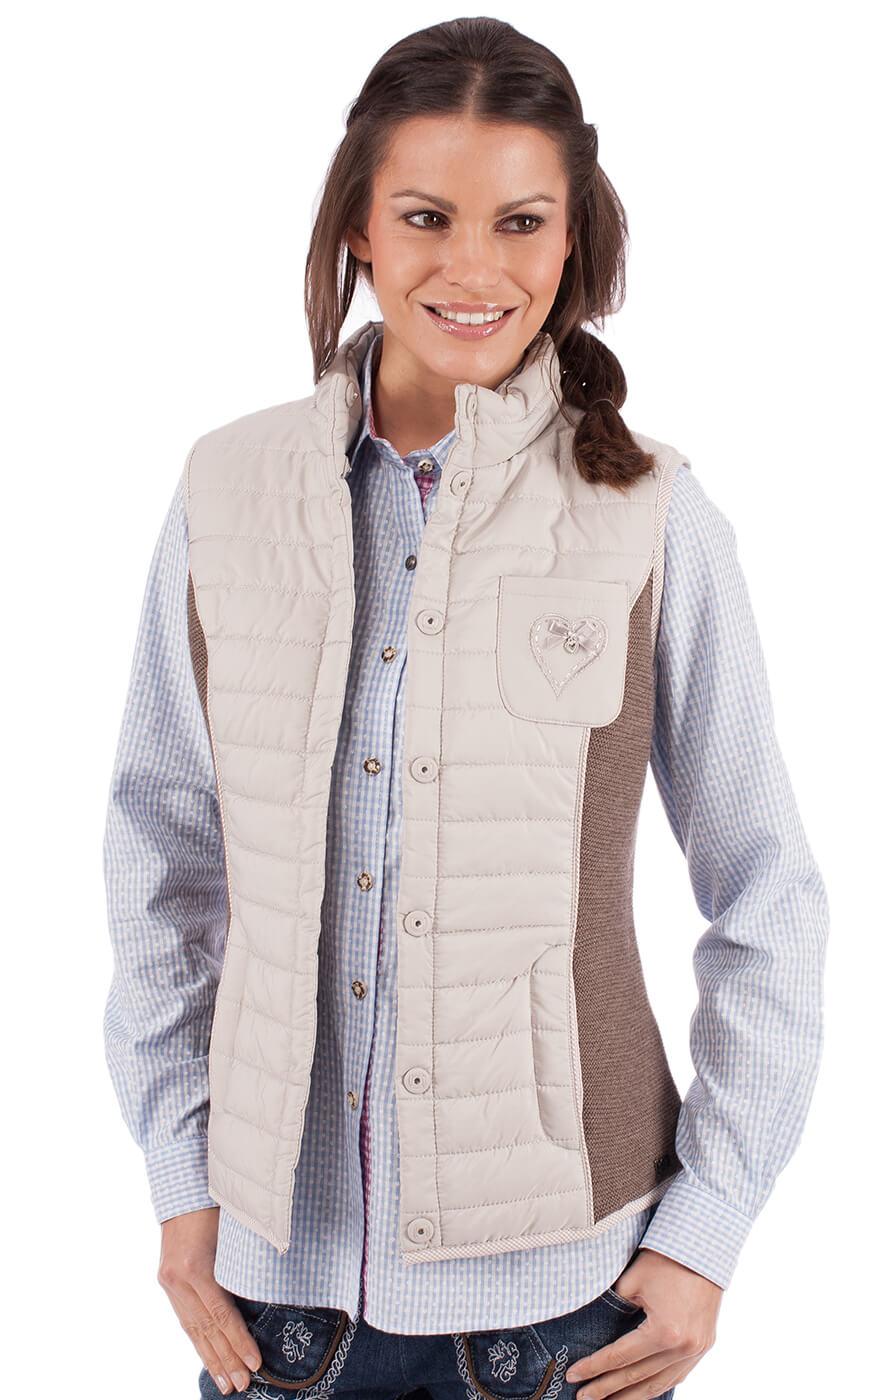 Gilet in maglia per Trachten ELKE grigio marrone von Spieth & Wensky